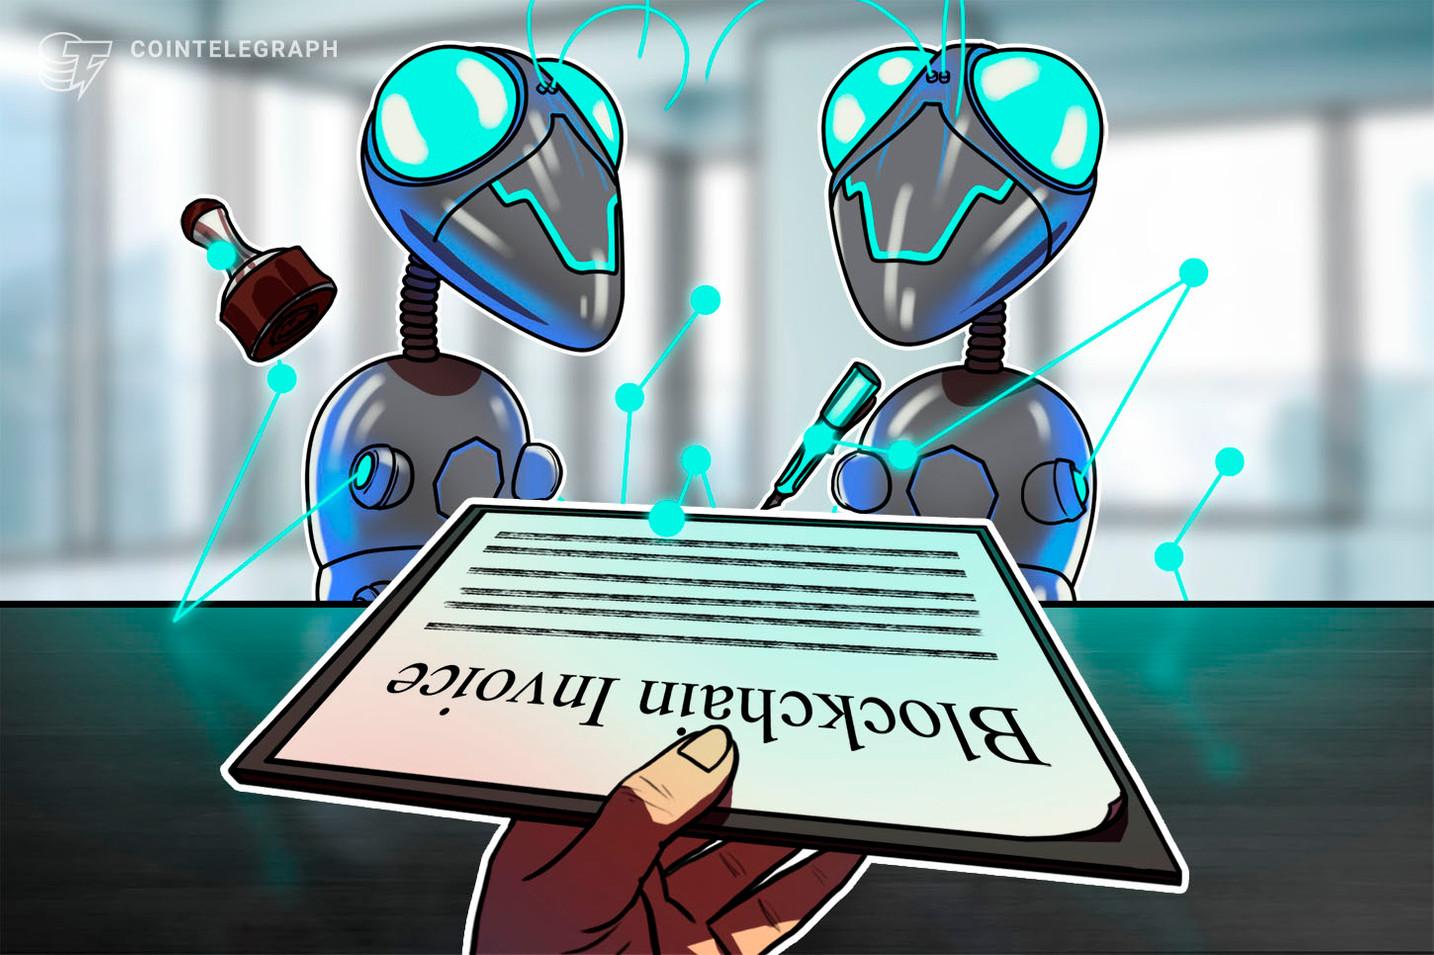 Çin'in Teknoloji Merkezi Shenzhen'de 10 Milyon Blockchain Faturası İşlendi